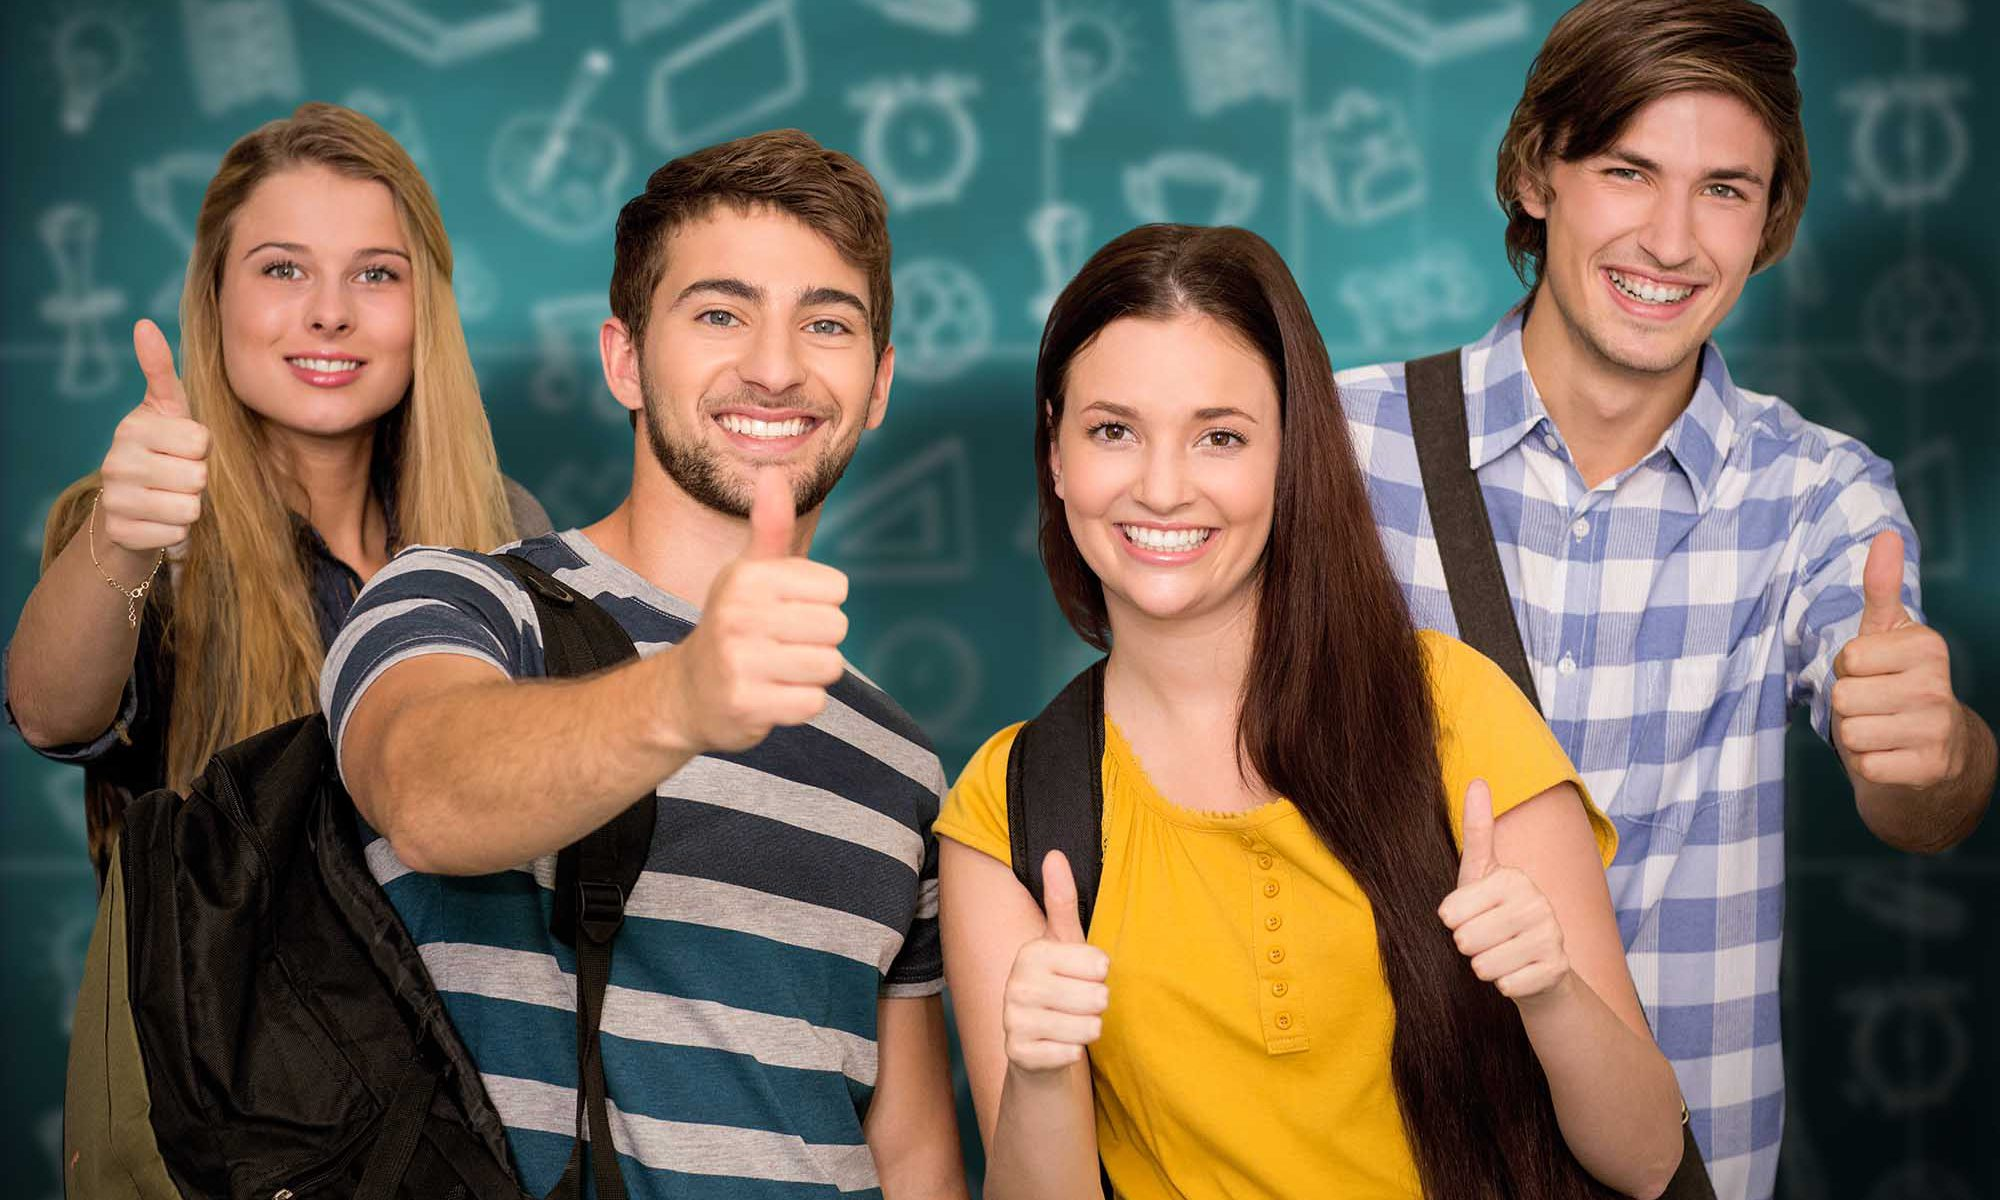 mejores universidades privadas de costa rica